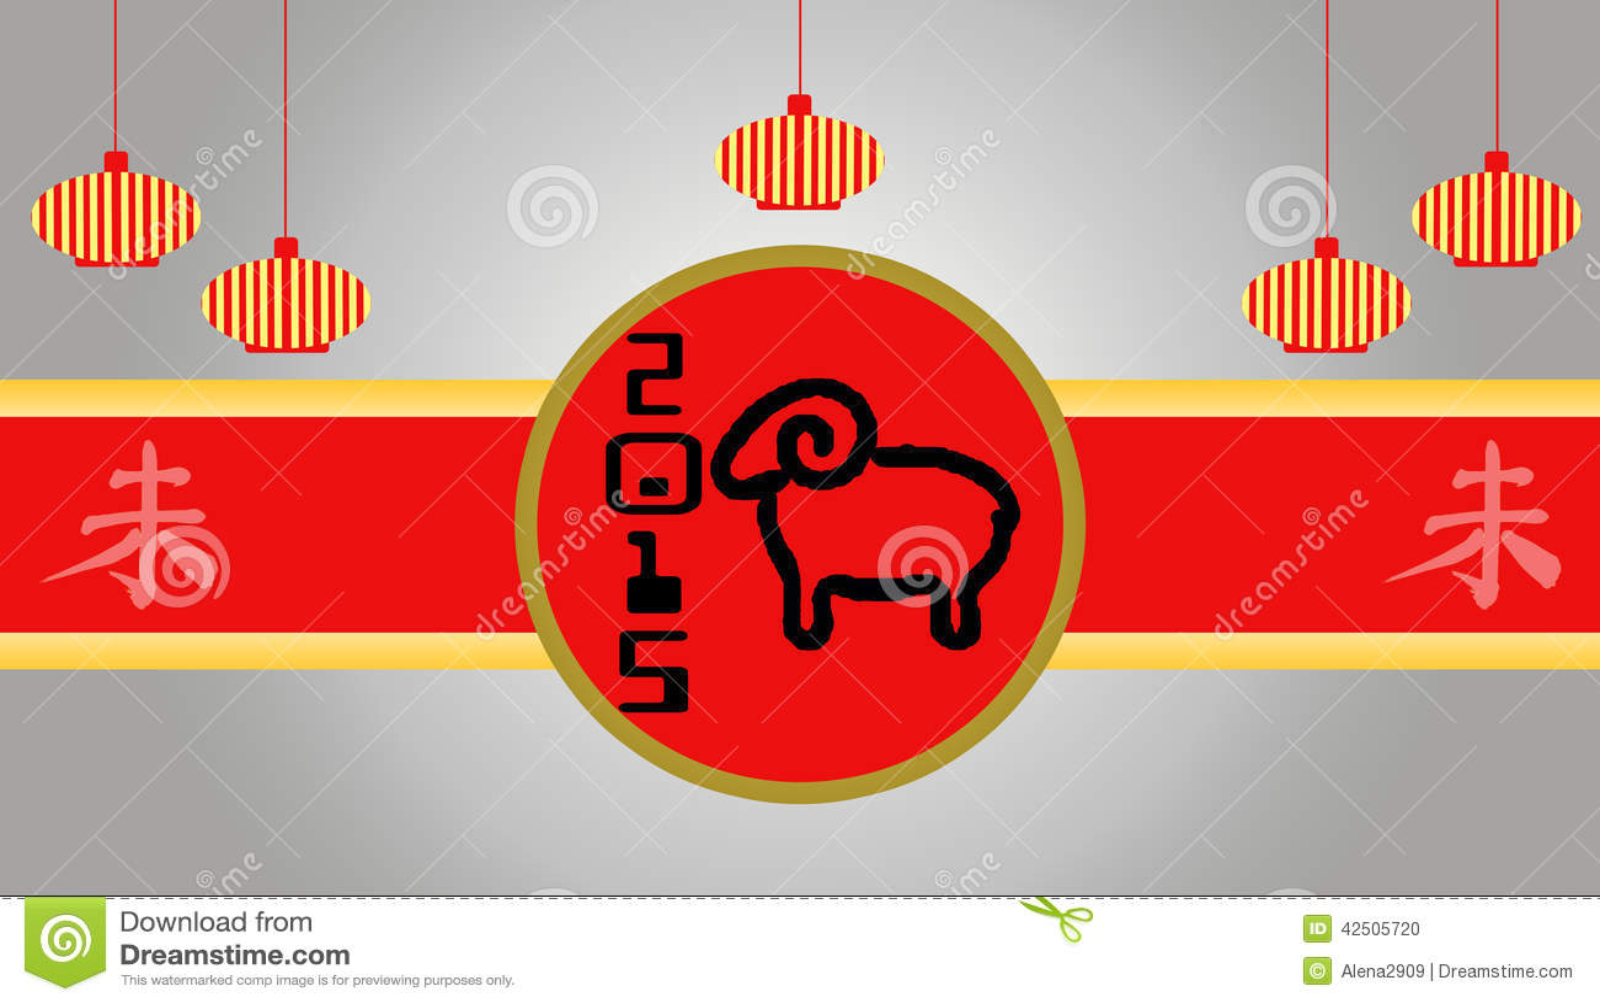 Chinese new year 2015 goat (sheep). Stock illustration.